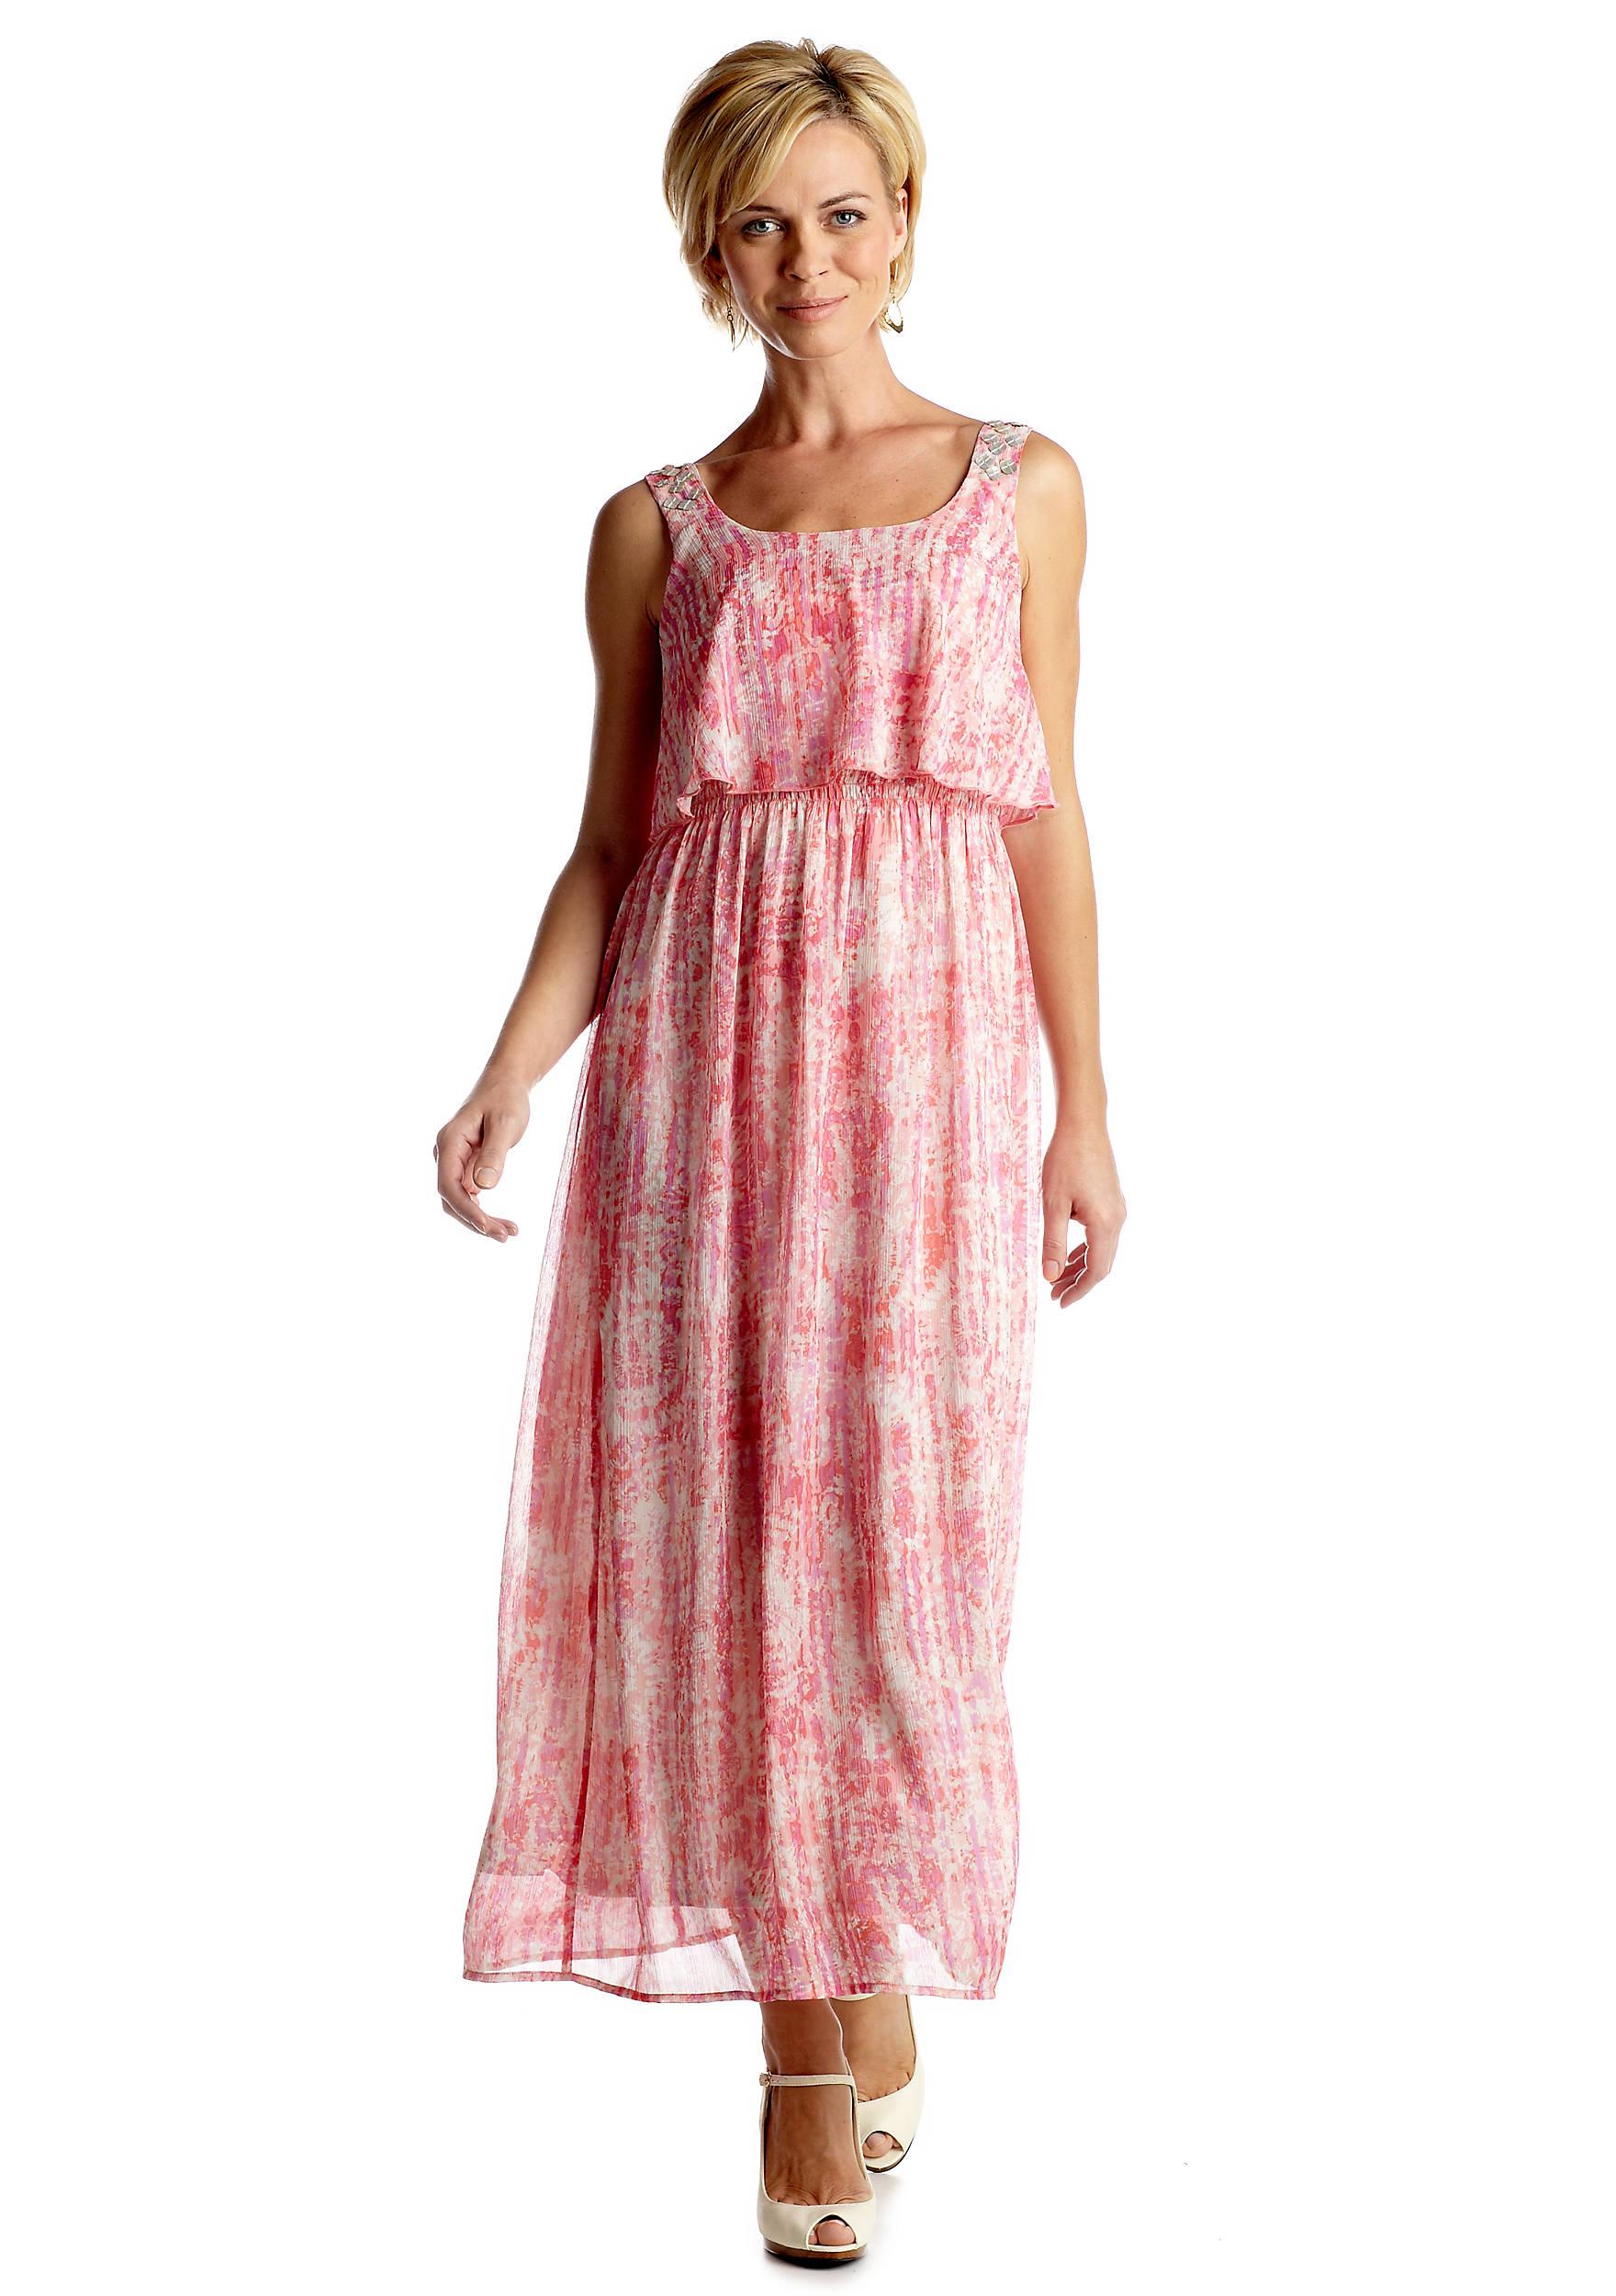 Famoso Cocktail Dresses Belk Viñeta - Colección de Vestidos de Boda ...